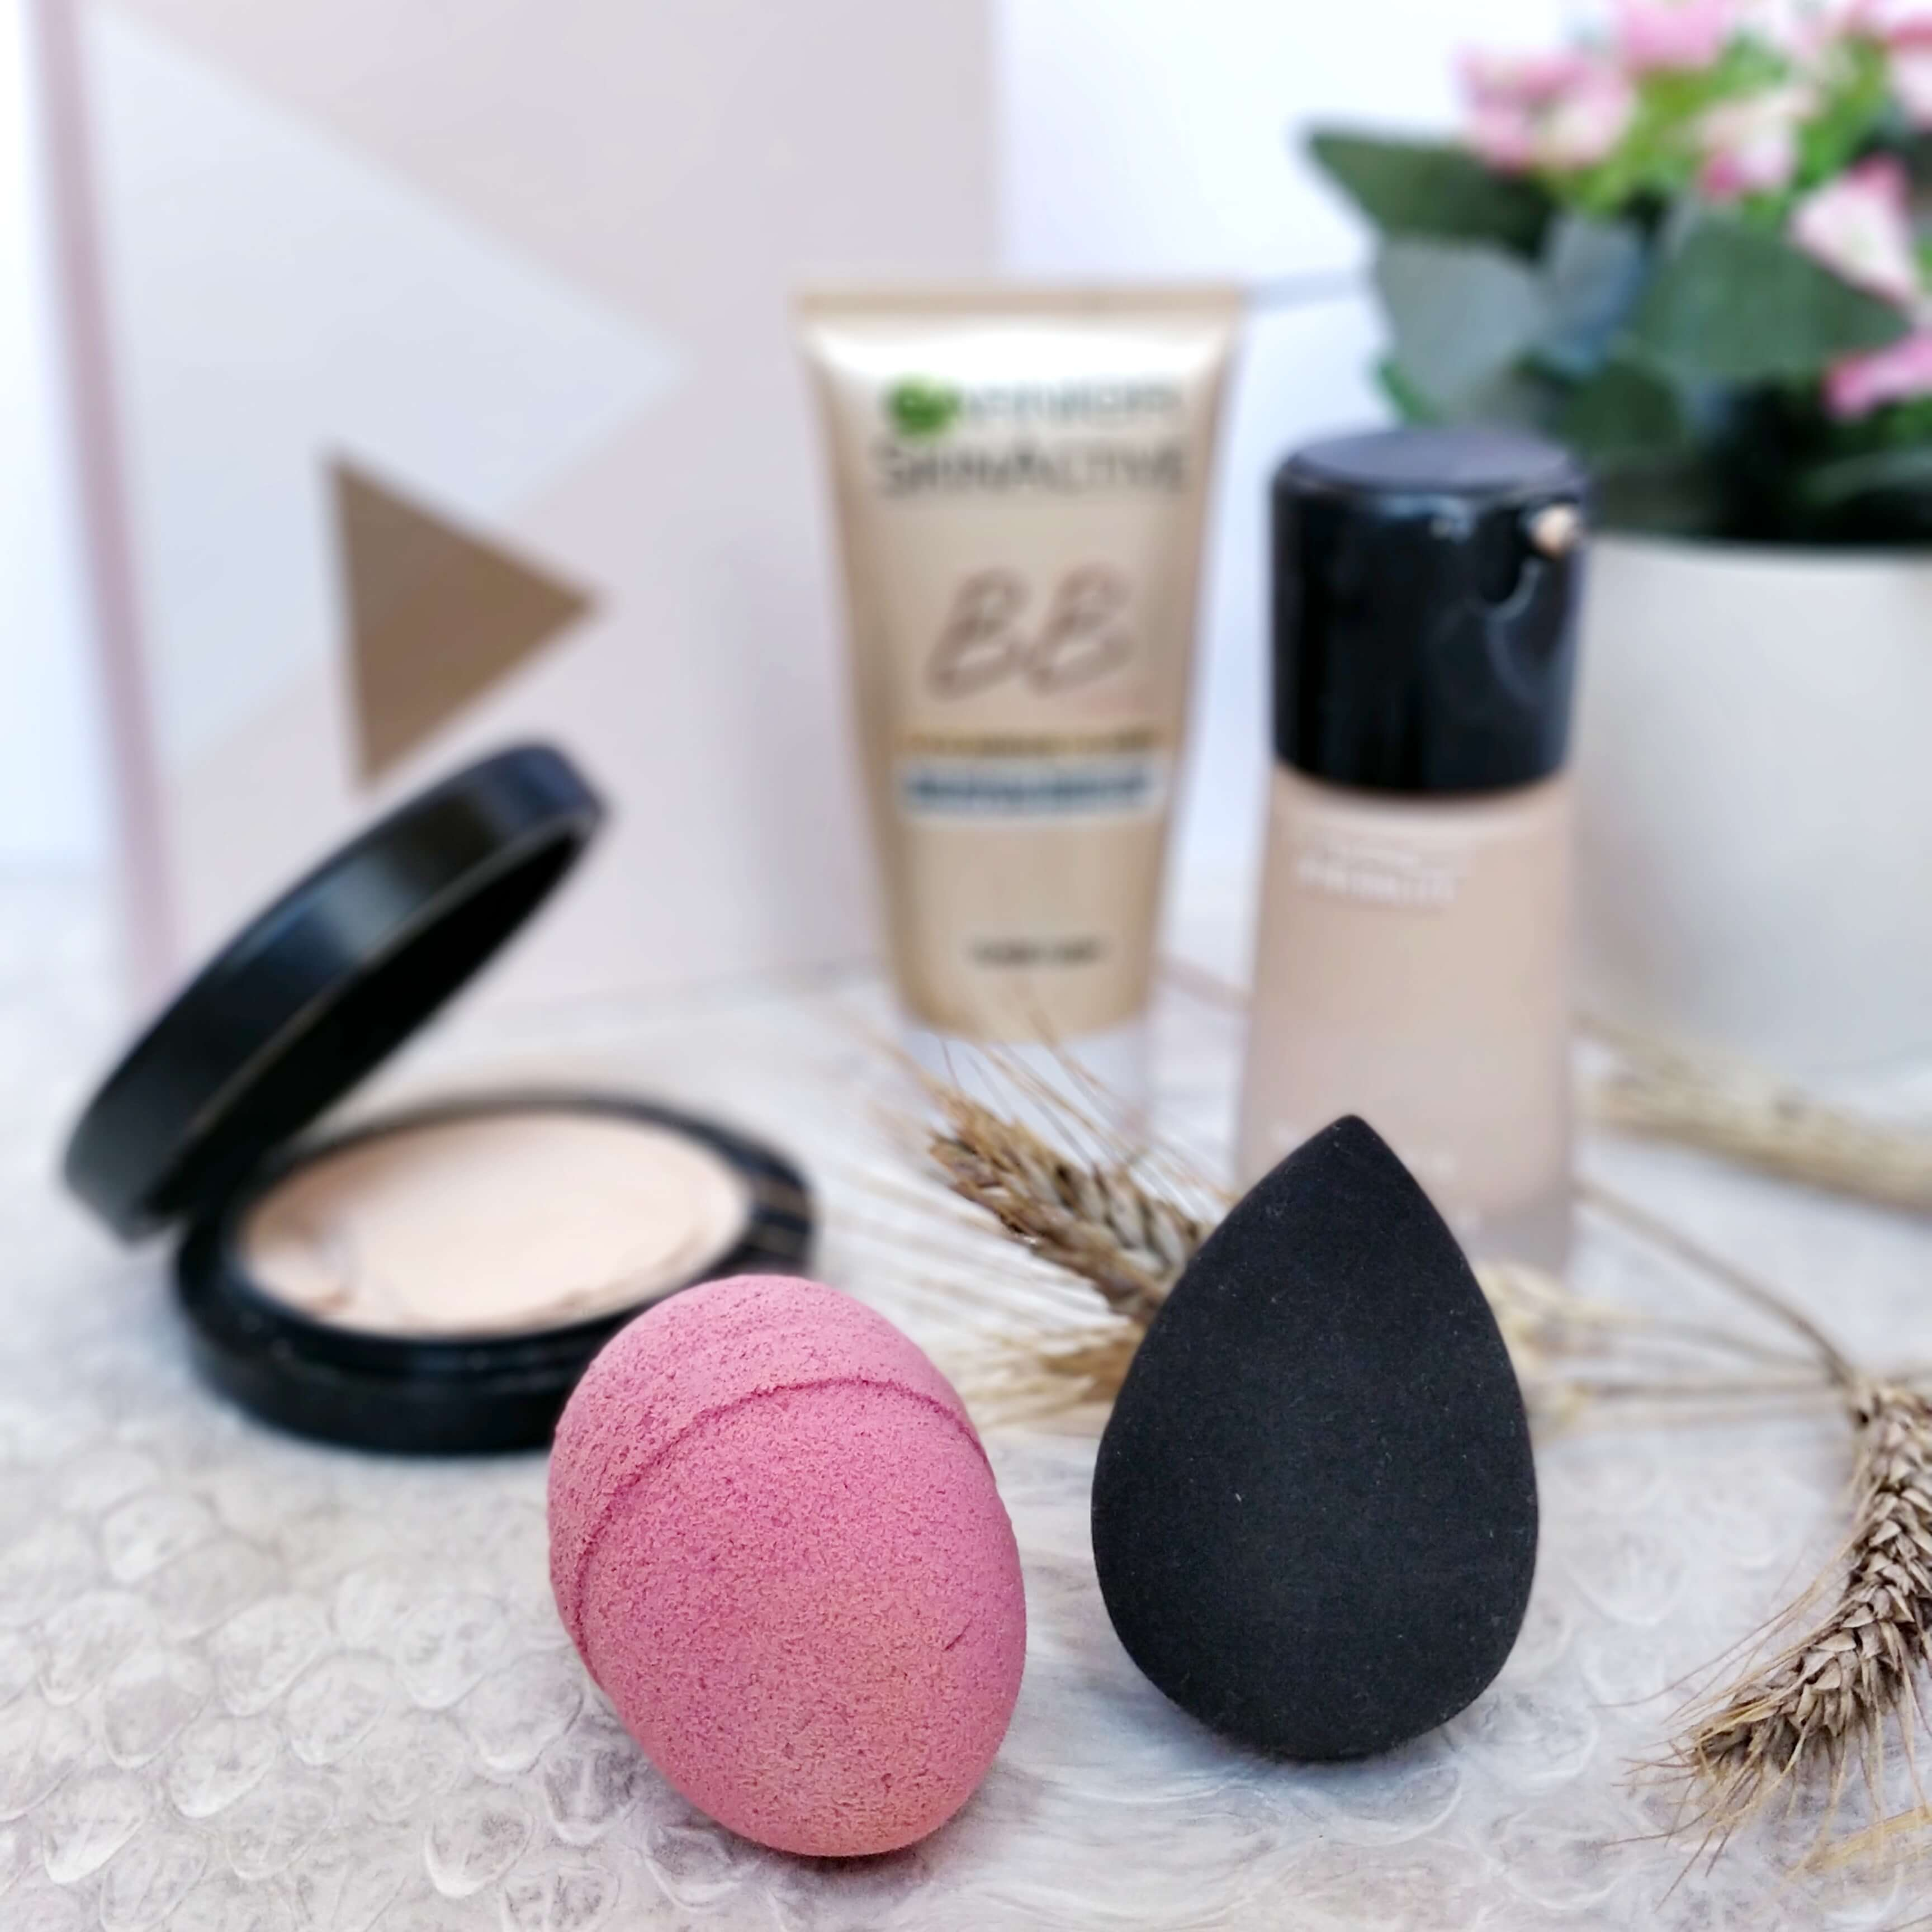 beauty blender make up - Ce qu'Instagram m'a fait acheter...